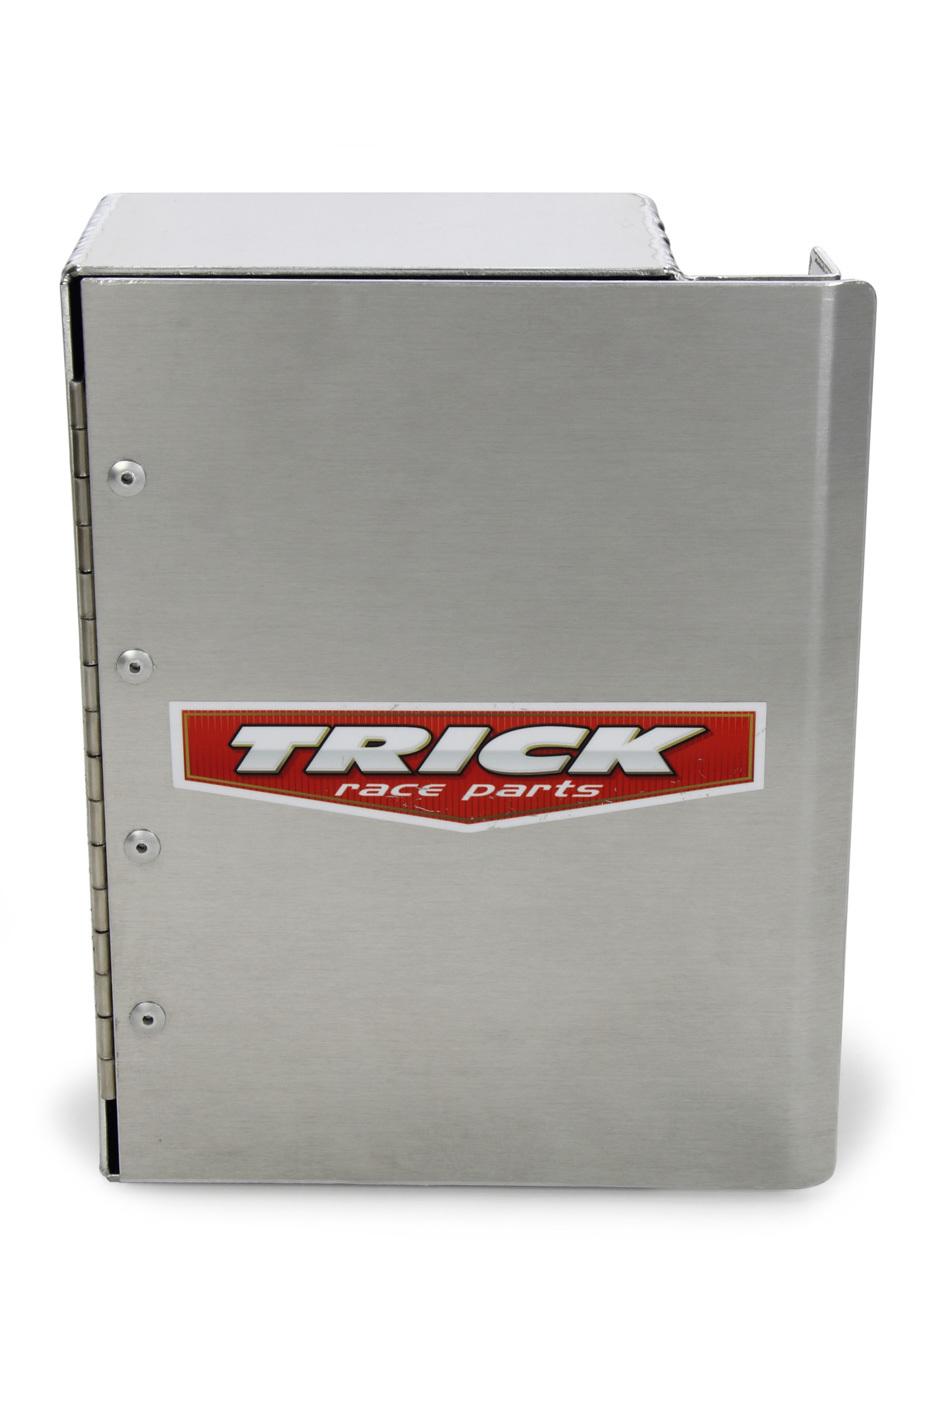 Trick Race Parts Storage Cutter Box 3 Head